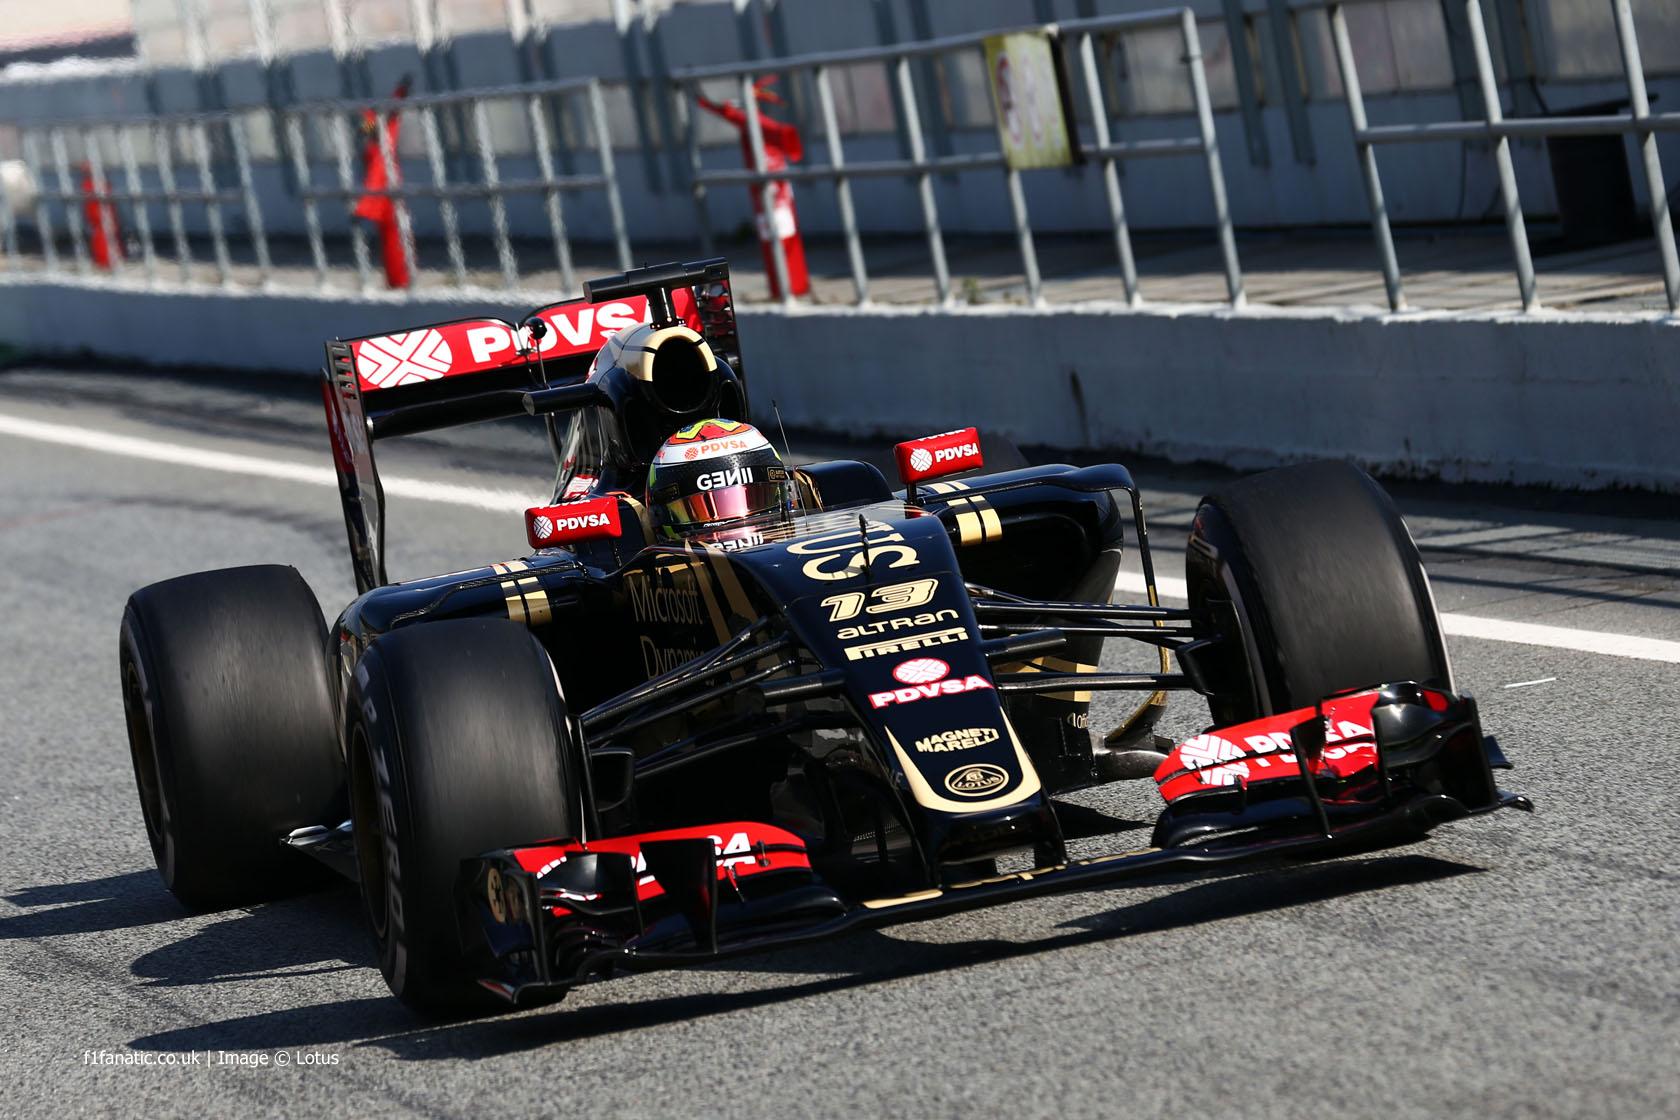 Pastor Maldonado, Lotus, Circuit de Catalunya, 2015